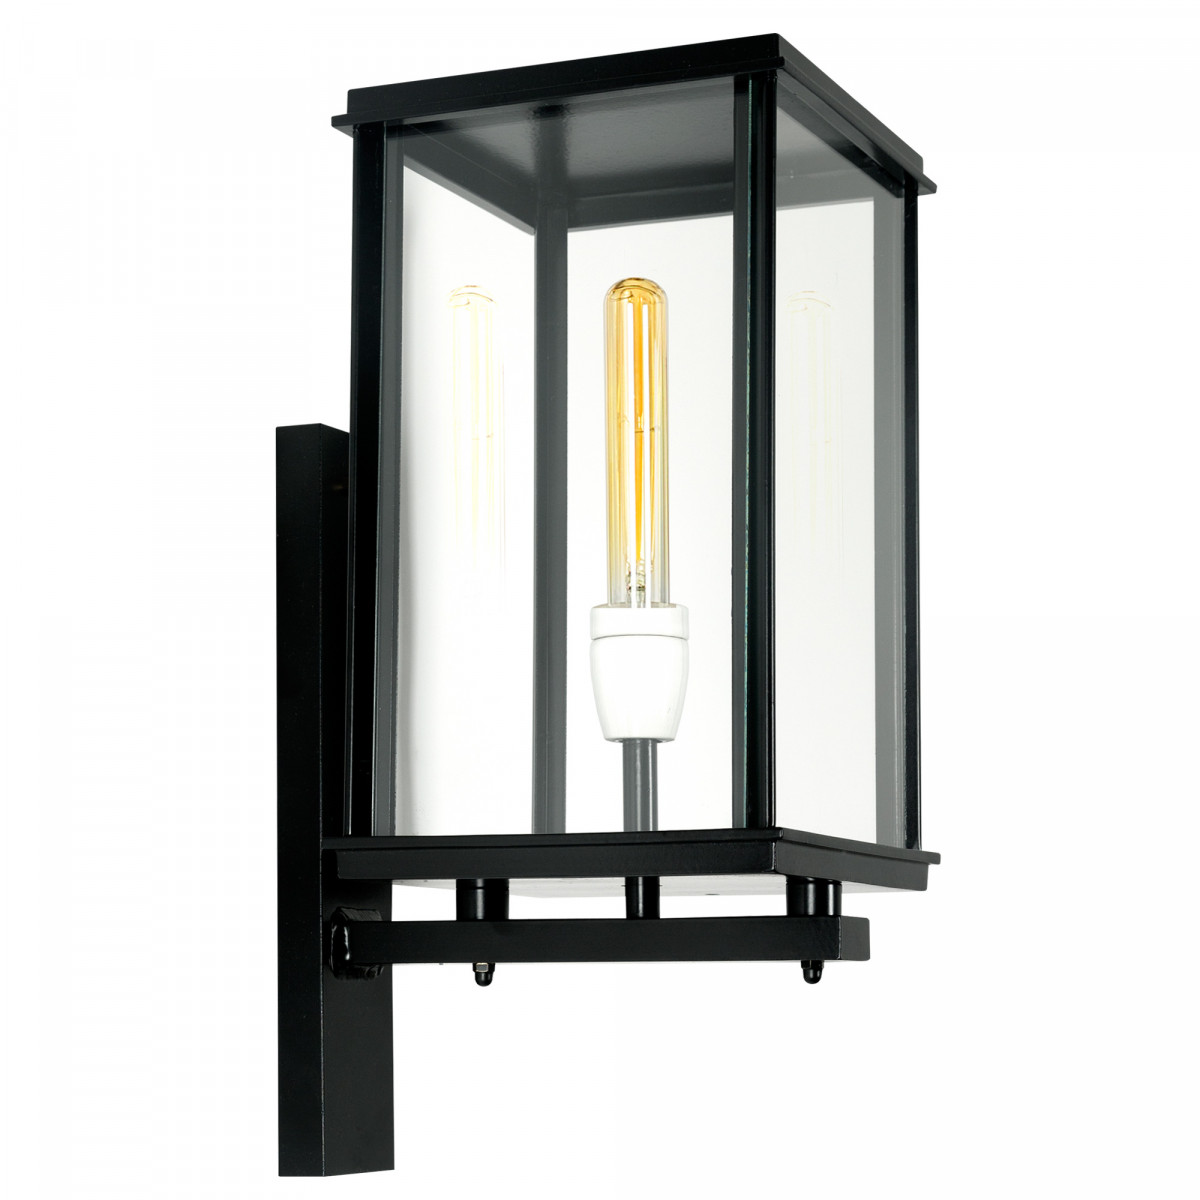 Vierkante buitenlamp Capital staand XL